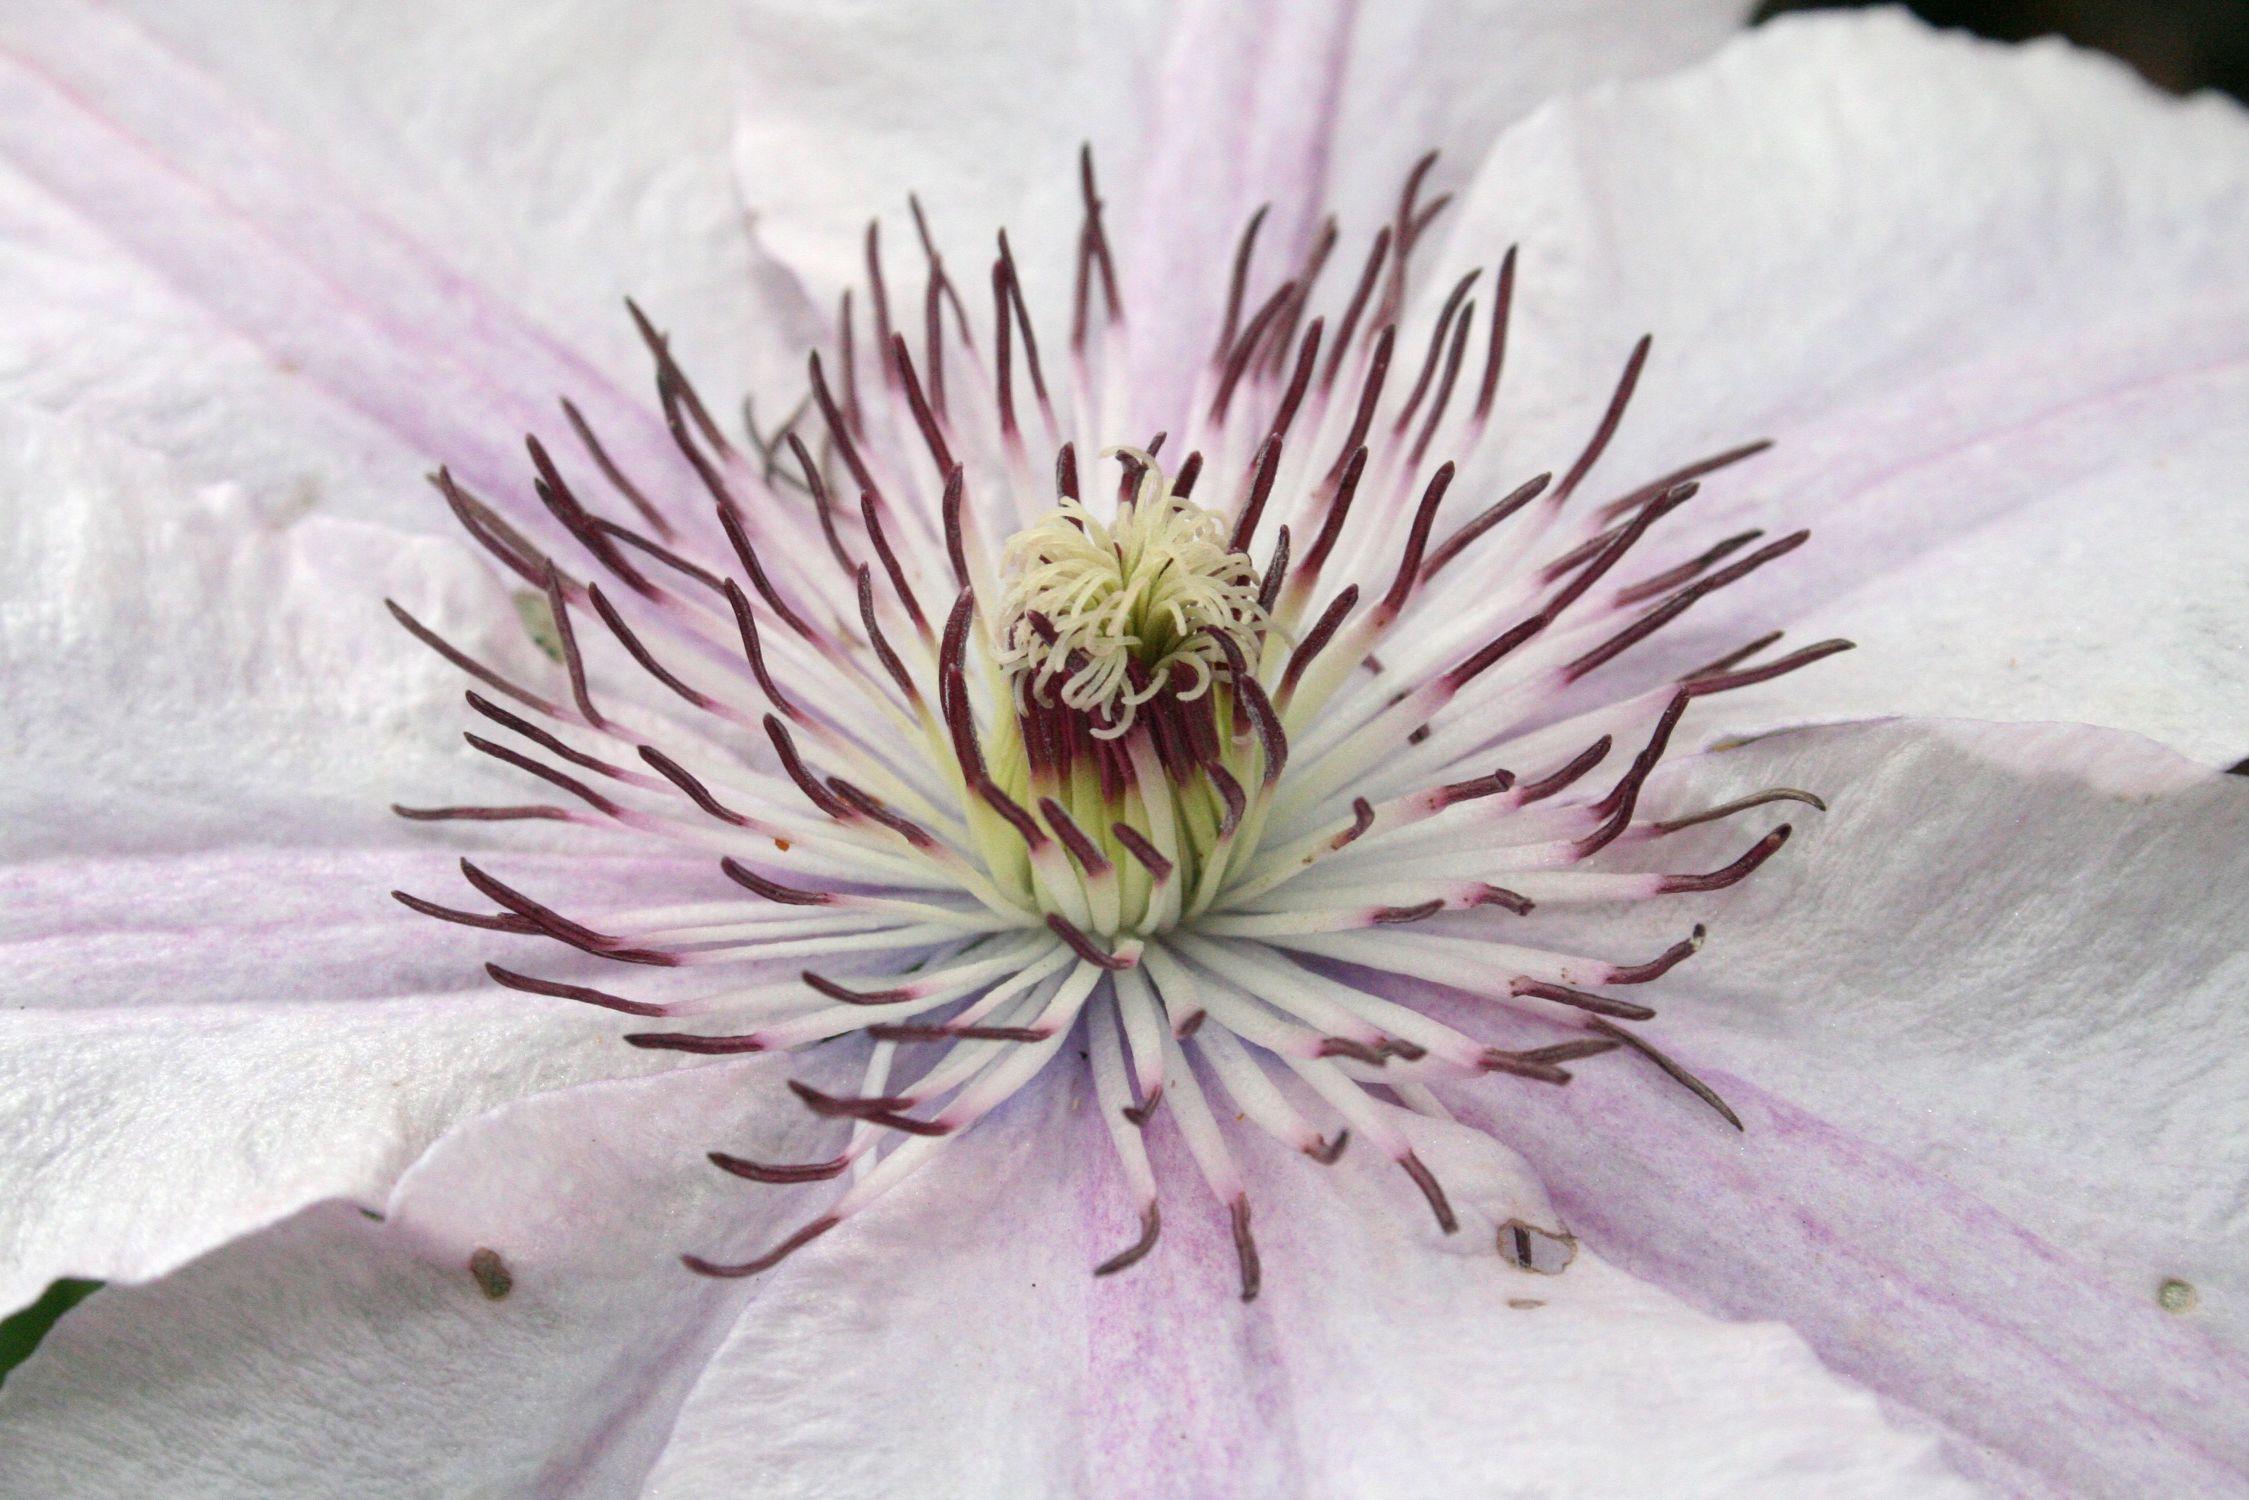 Bild mit Natur, Pflanzen, Blumen, Rosa, Mohn, Blume, Pflanze